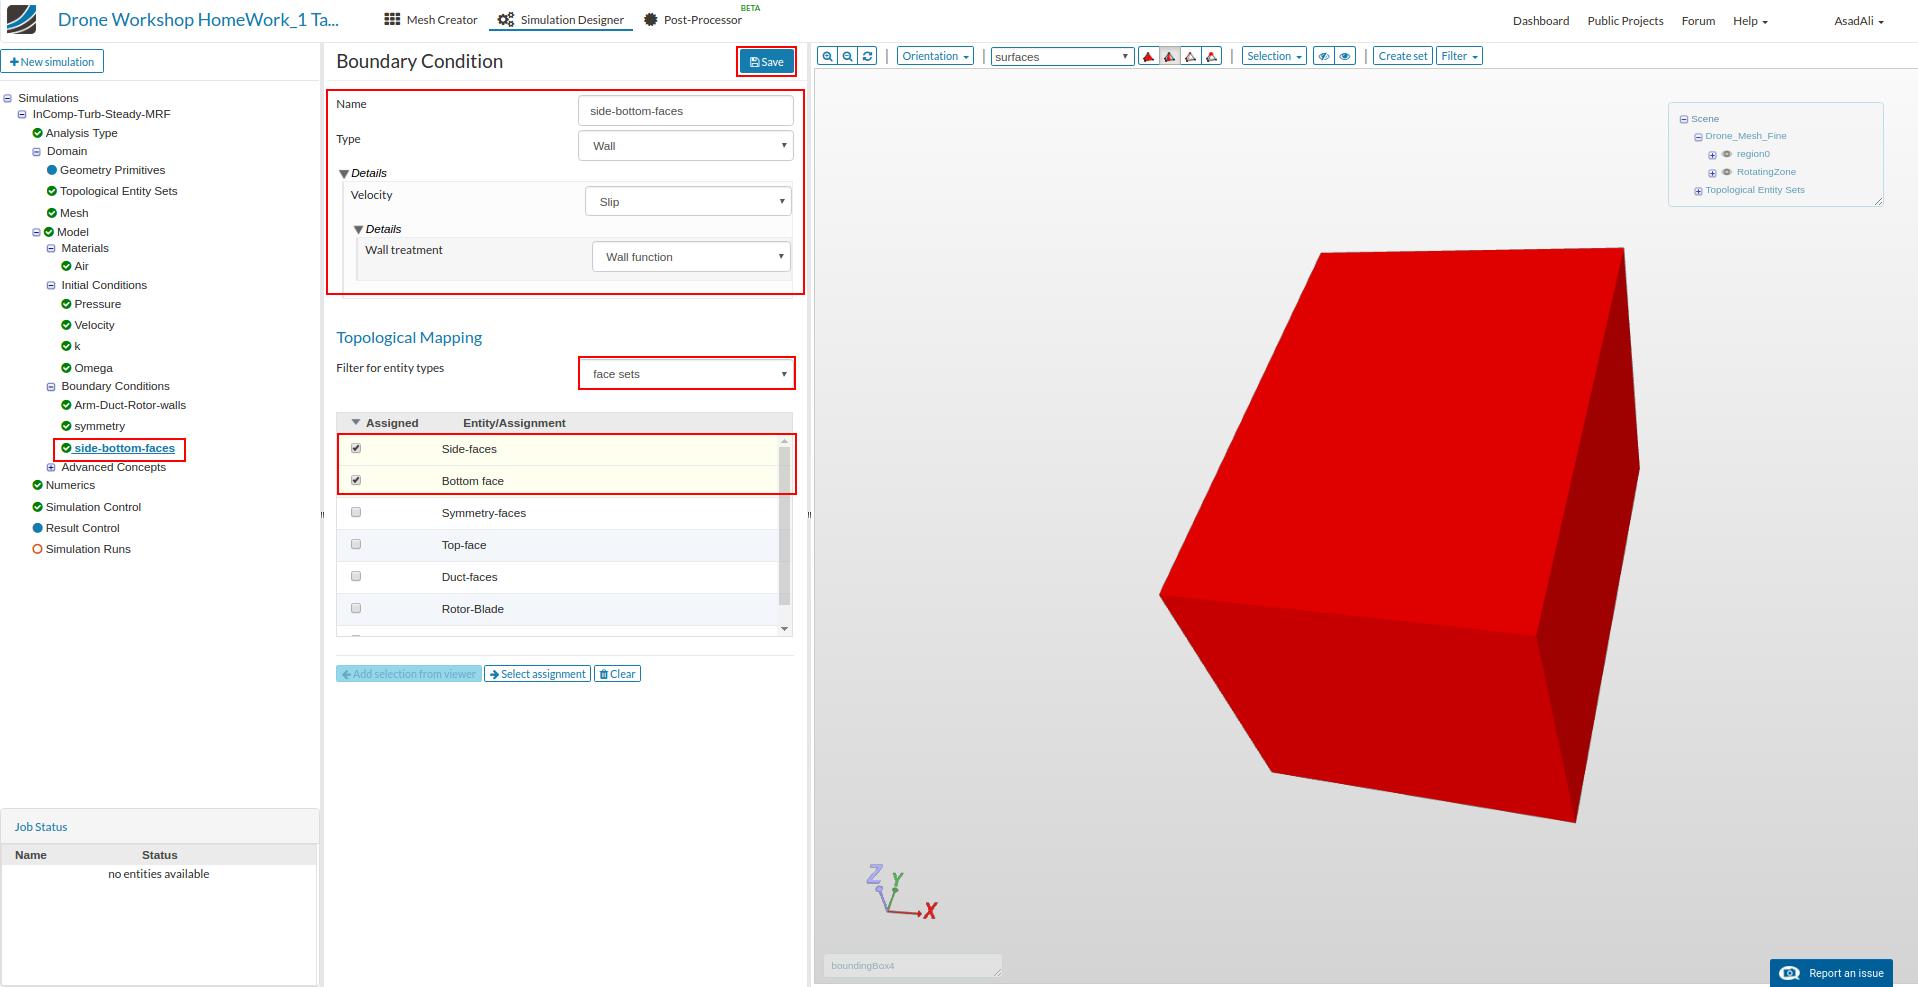 diy drone design simulation setup, slipwall boundary condition